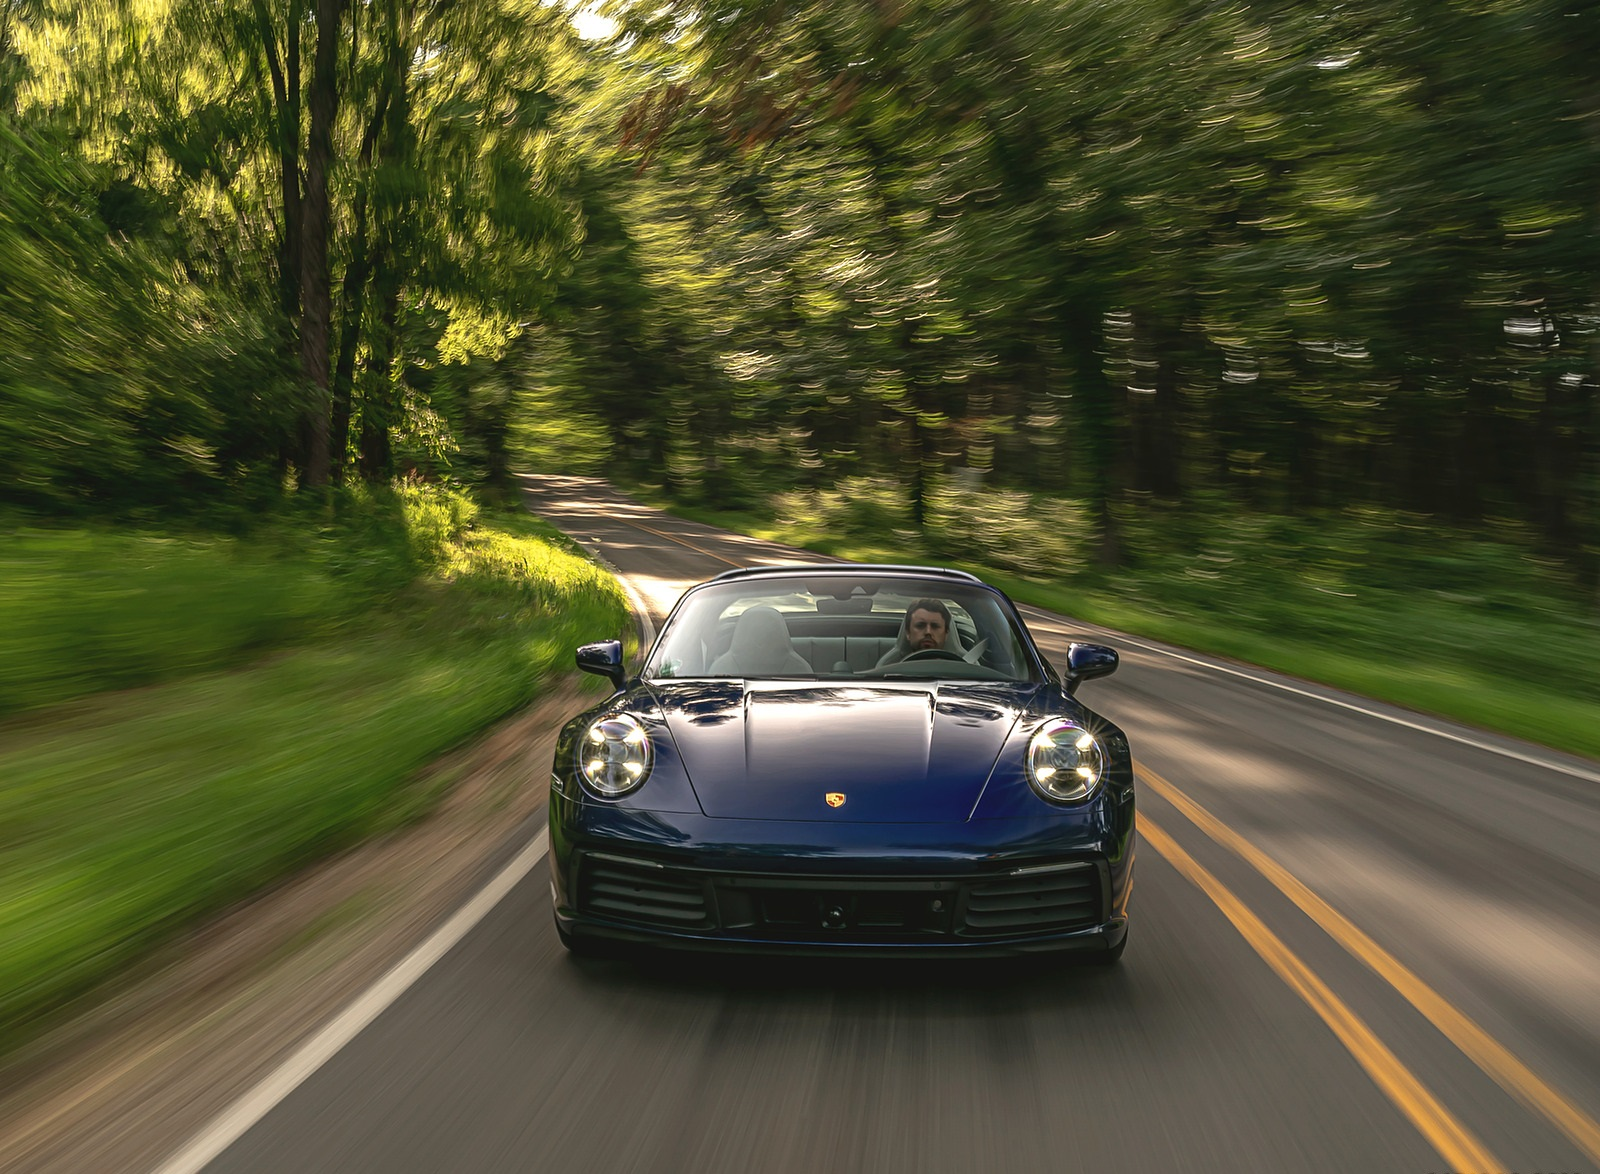 2021 Porsche 911 Targa 4 (Color: Gentian Blue) Front Wallpapers (1)